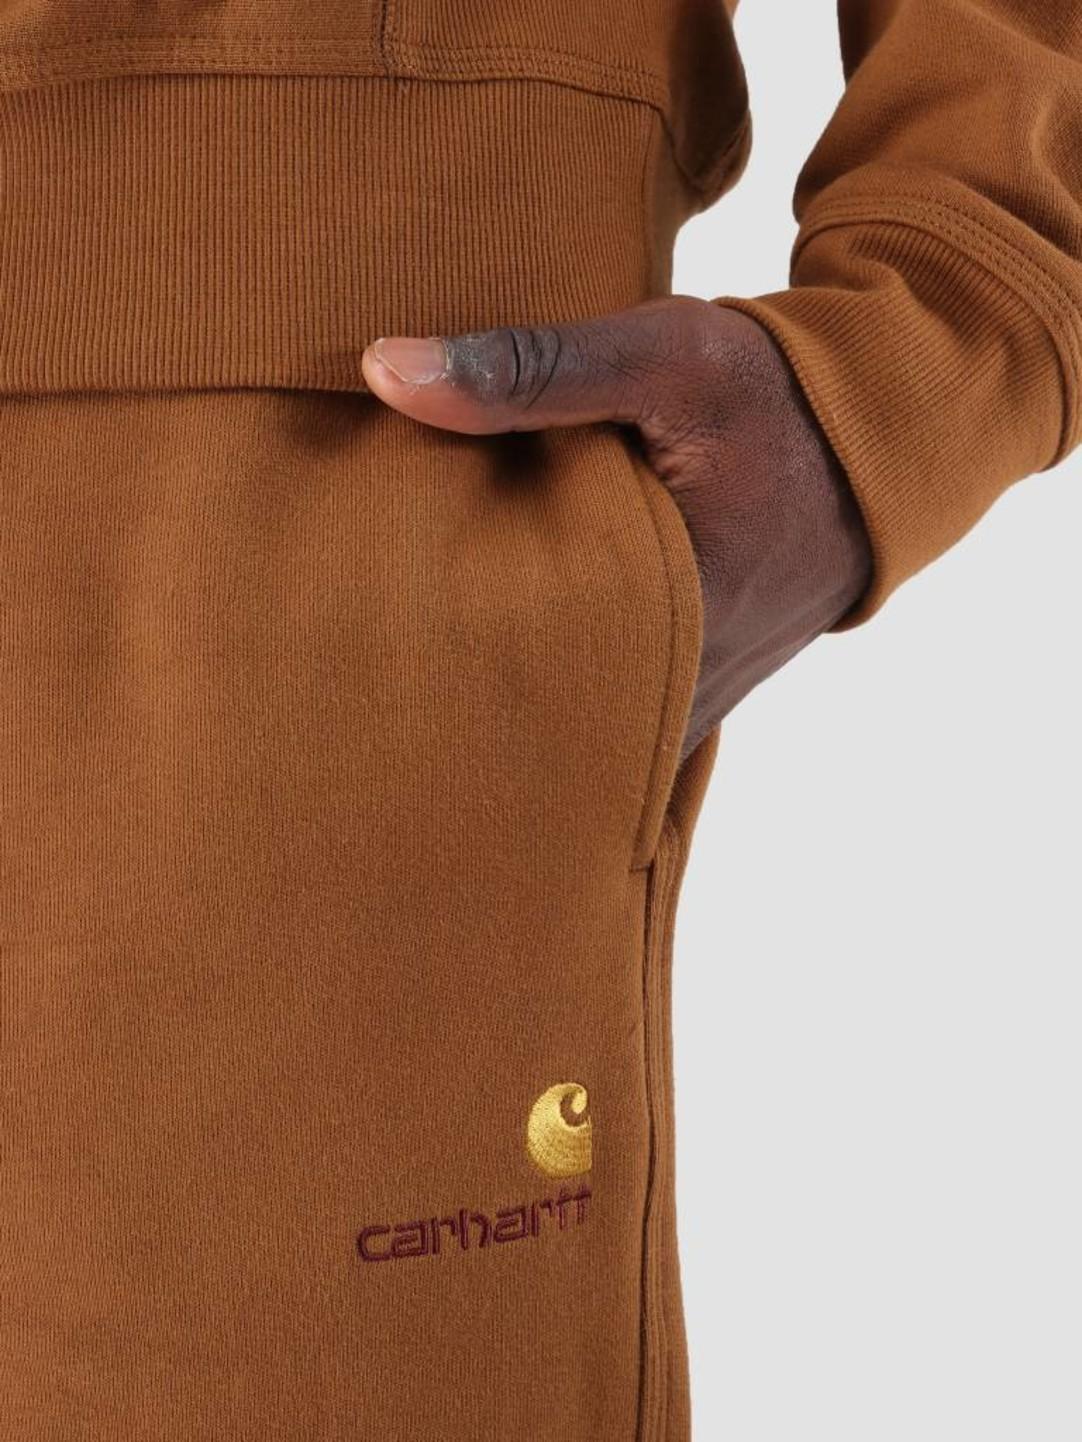 Carhartt WIP Carhartt WIP American Script Sweat Pant Hamilton Brown I025476